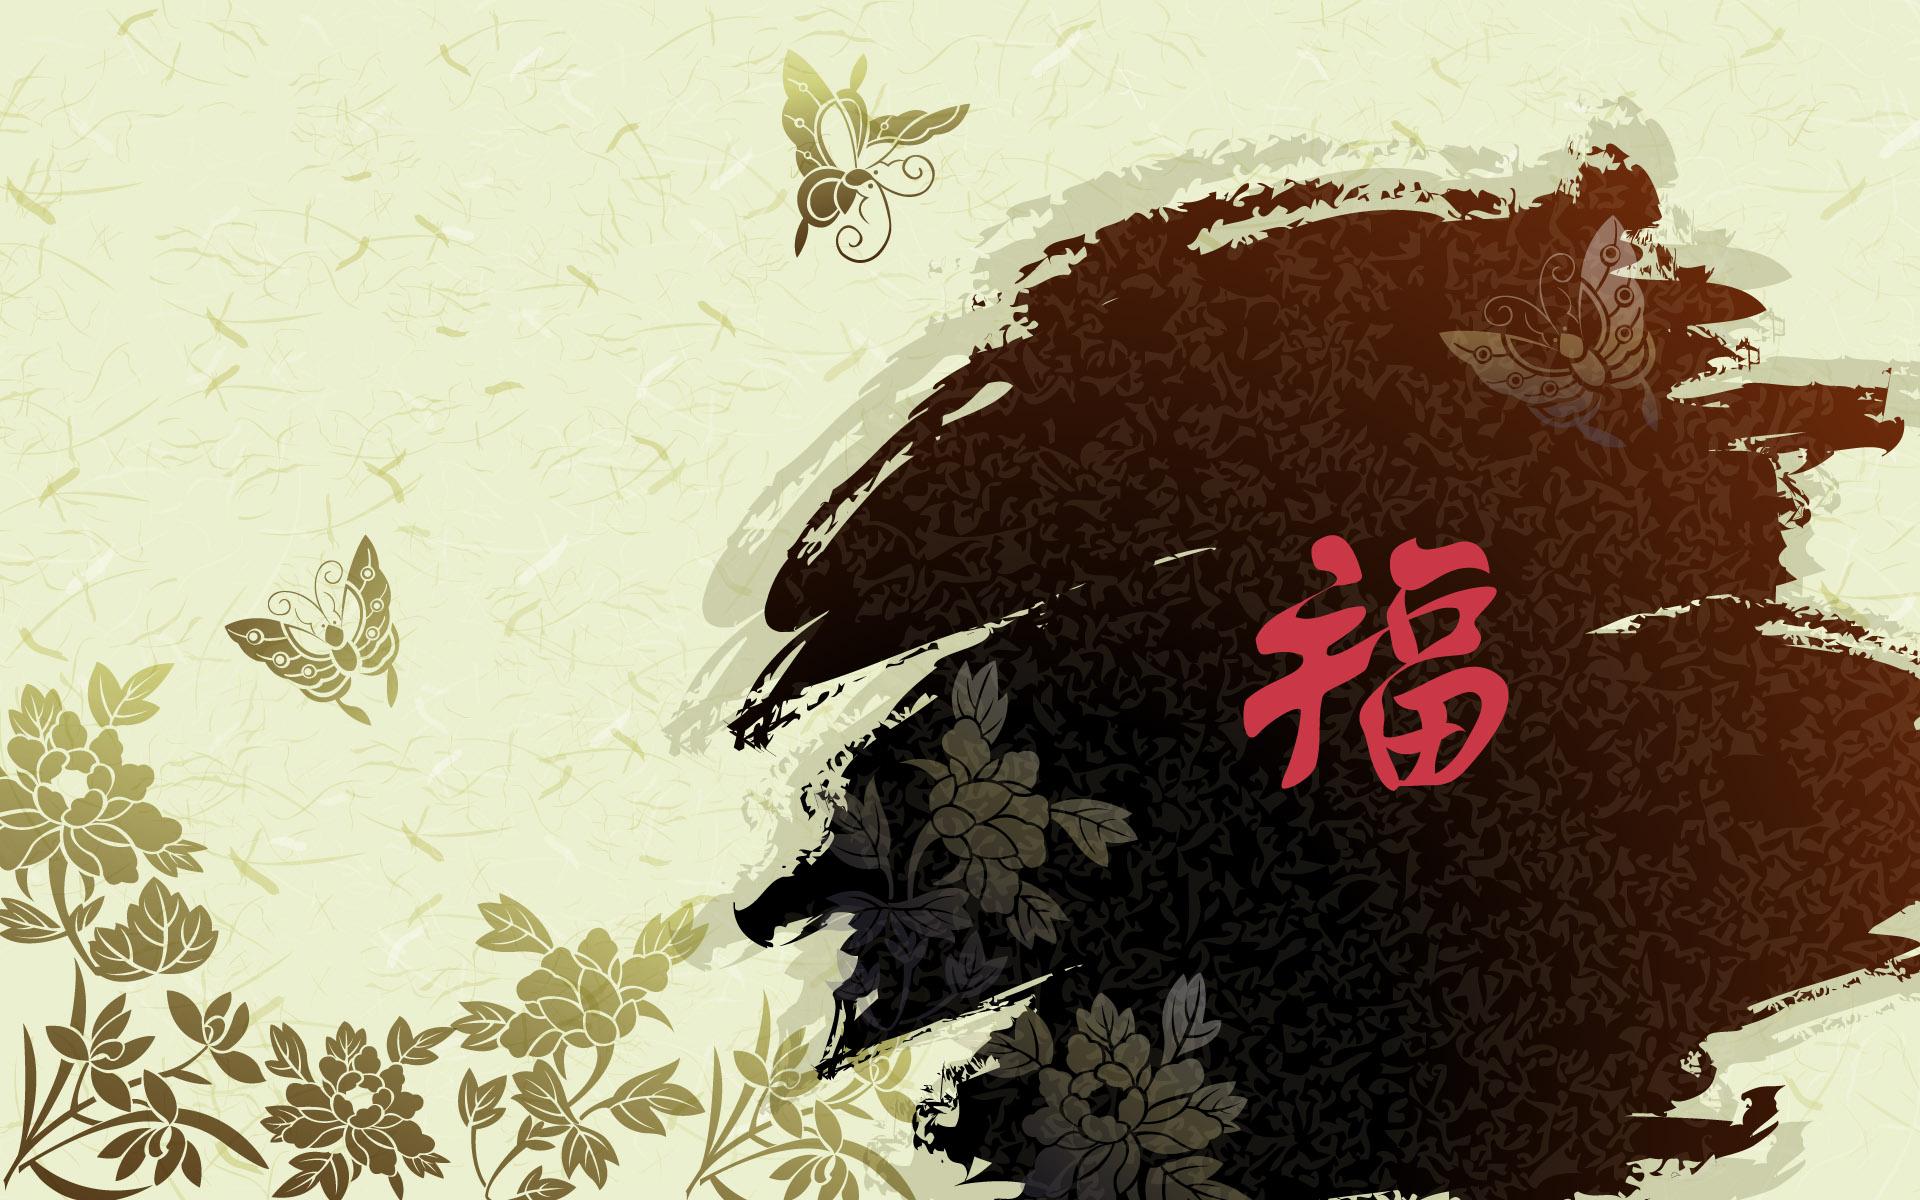 Fall Hd Wallpapers 1080p Chinese Wallpaper Designs Download Free Pixelstalk Net